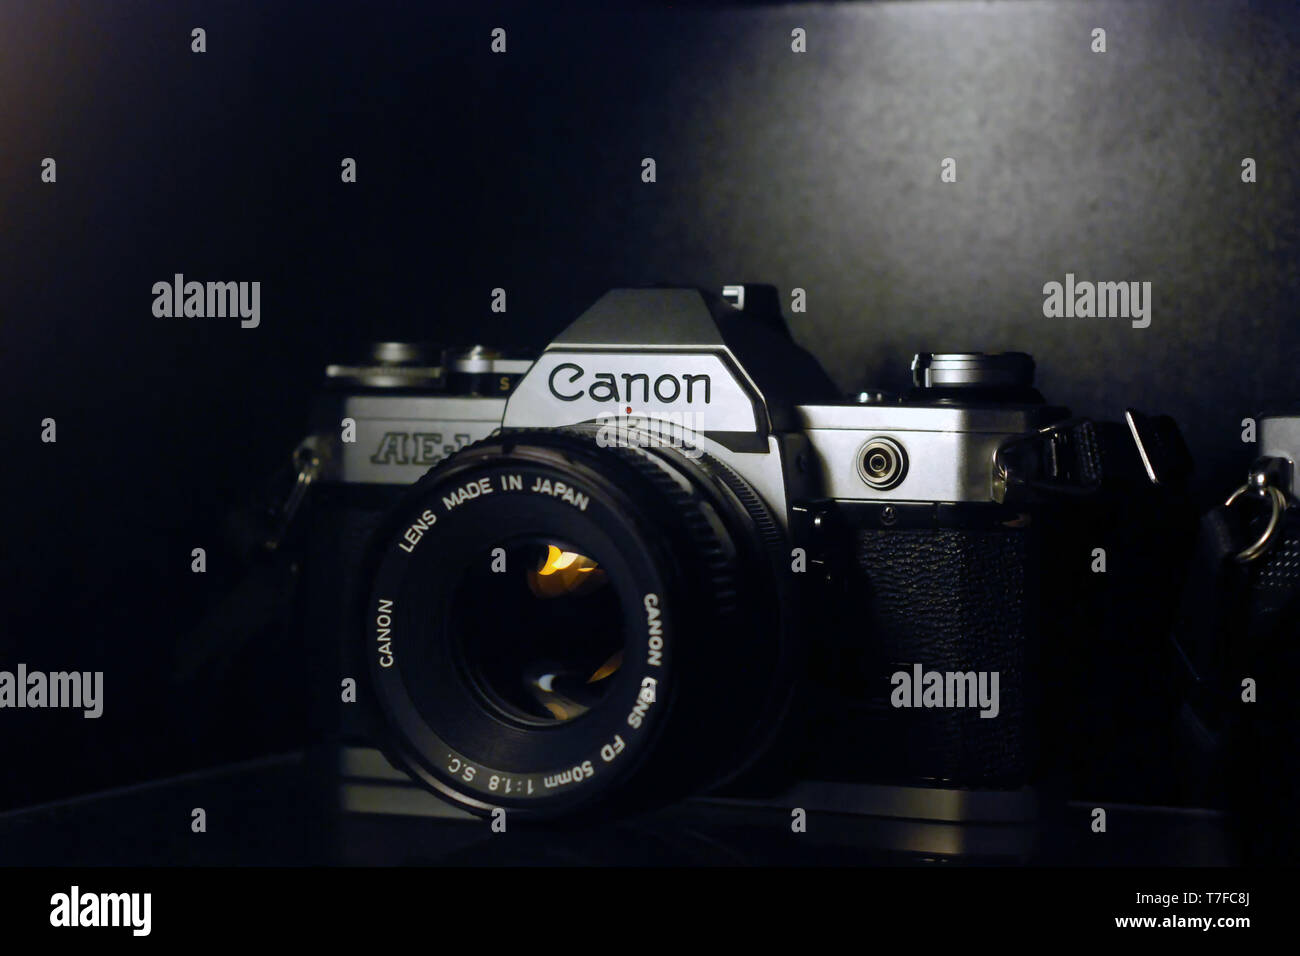 7 January 2013, Eskisehir, Turkey. Canon 35mm slr camera on black background - Stock Image